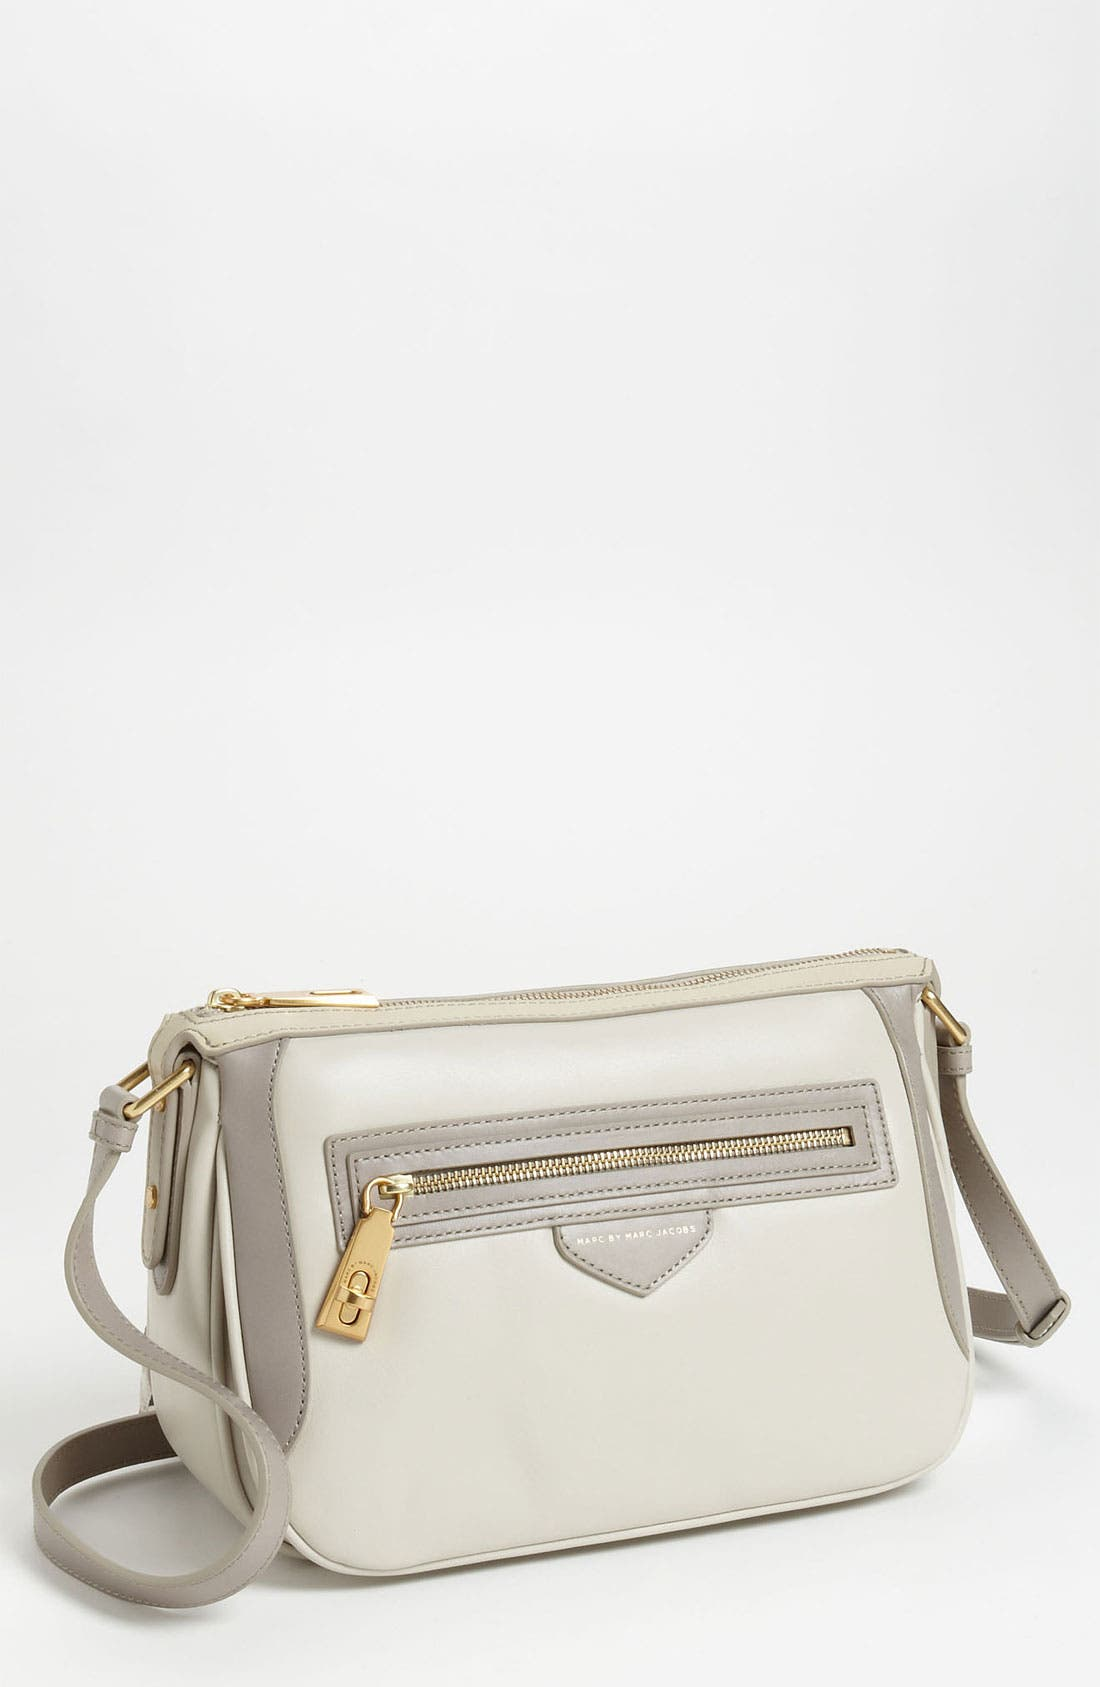 Main Image - MARC BY MARC JACOBS 'The Ziplocker Sophie - Mini' Leather Crossbody Bag